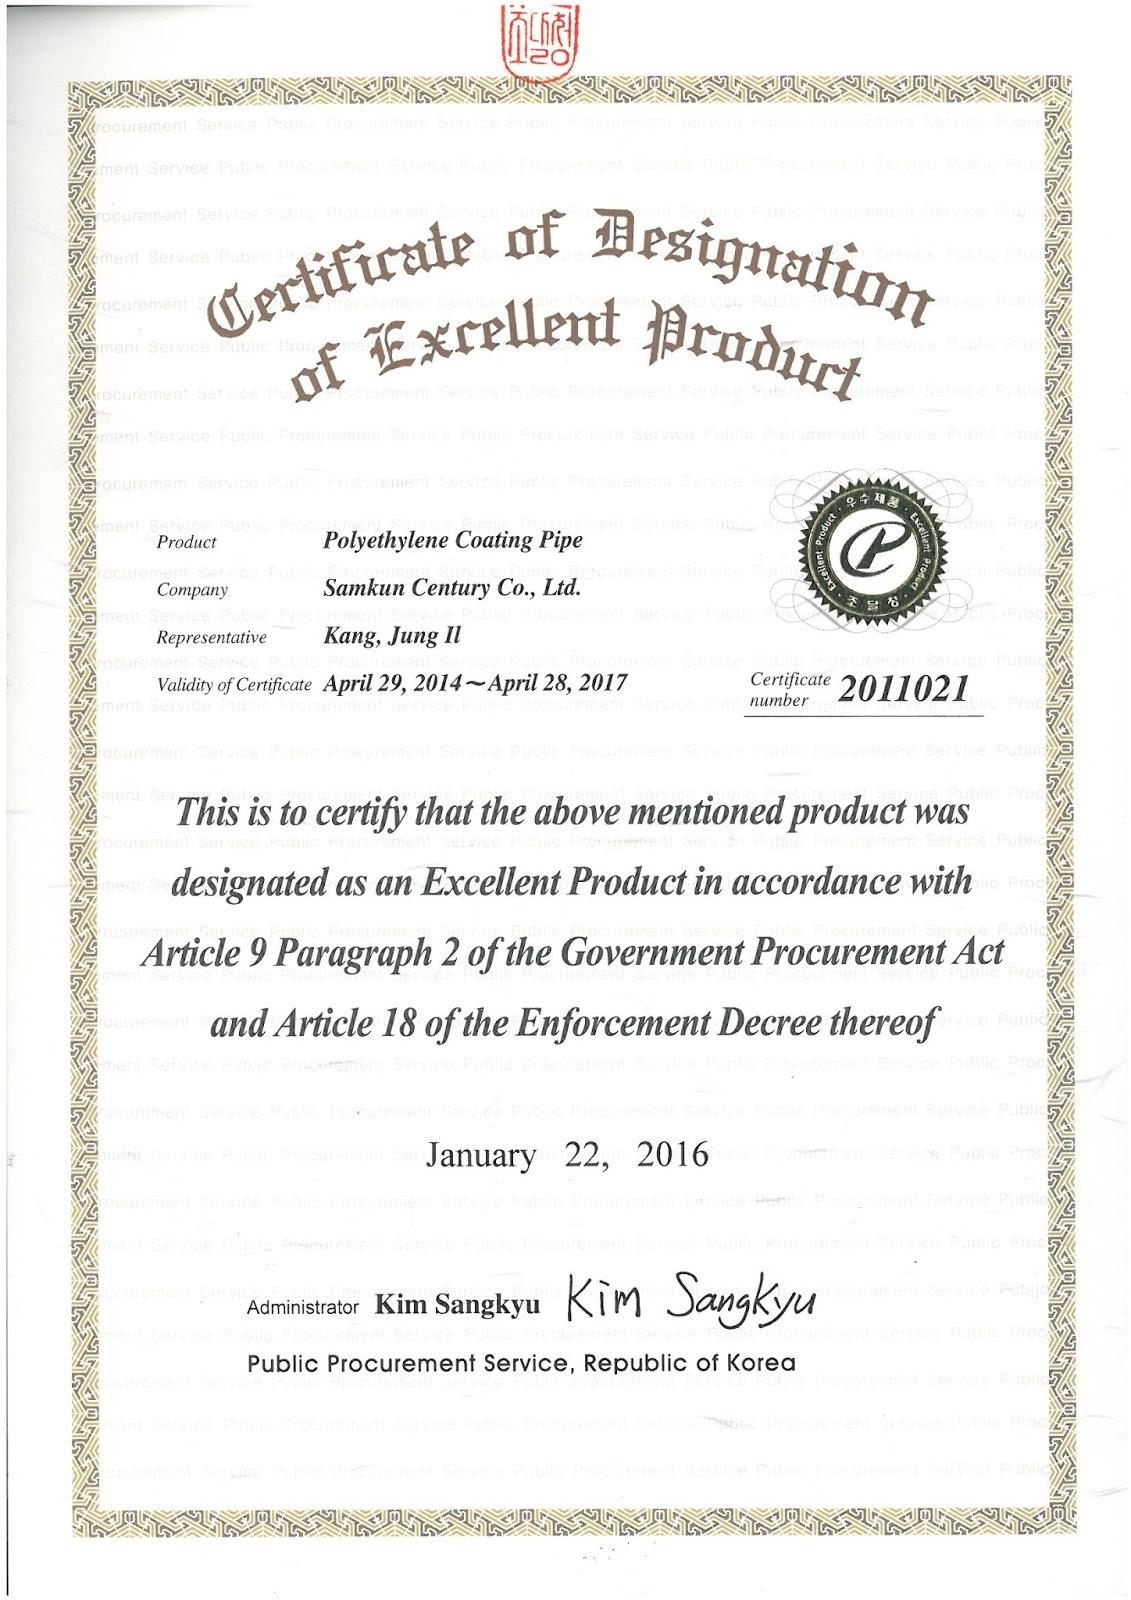 Samkun Certificate Of Designation Of Excellent Product